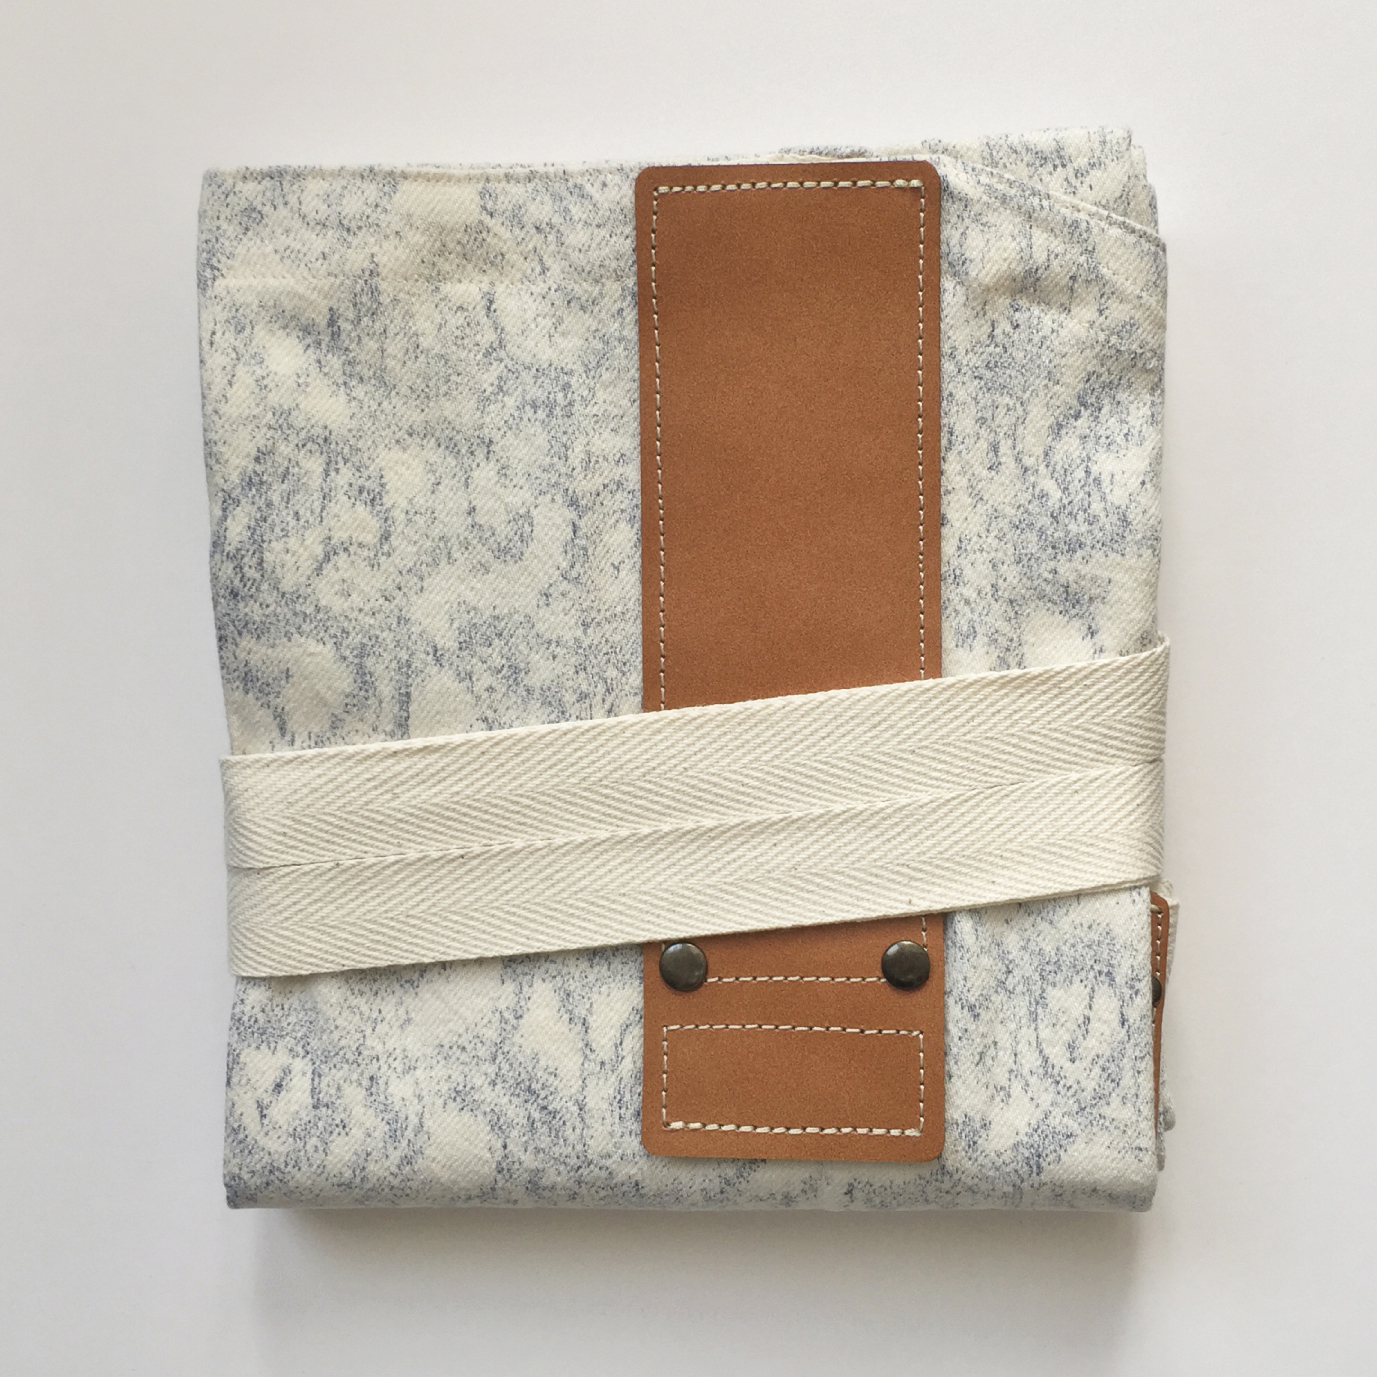 PAISLEYBLUExBROWN HASHIRA-JYU mitten pocket set